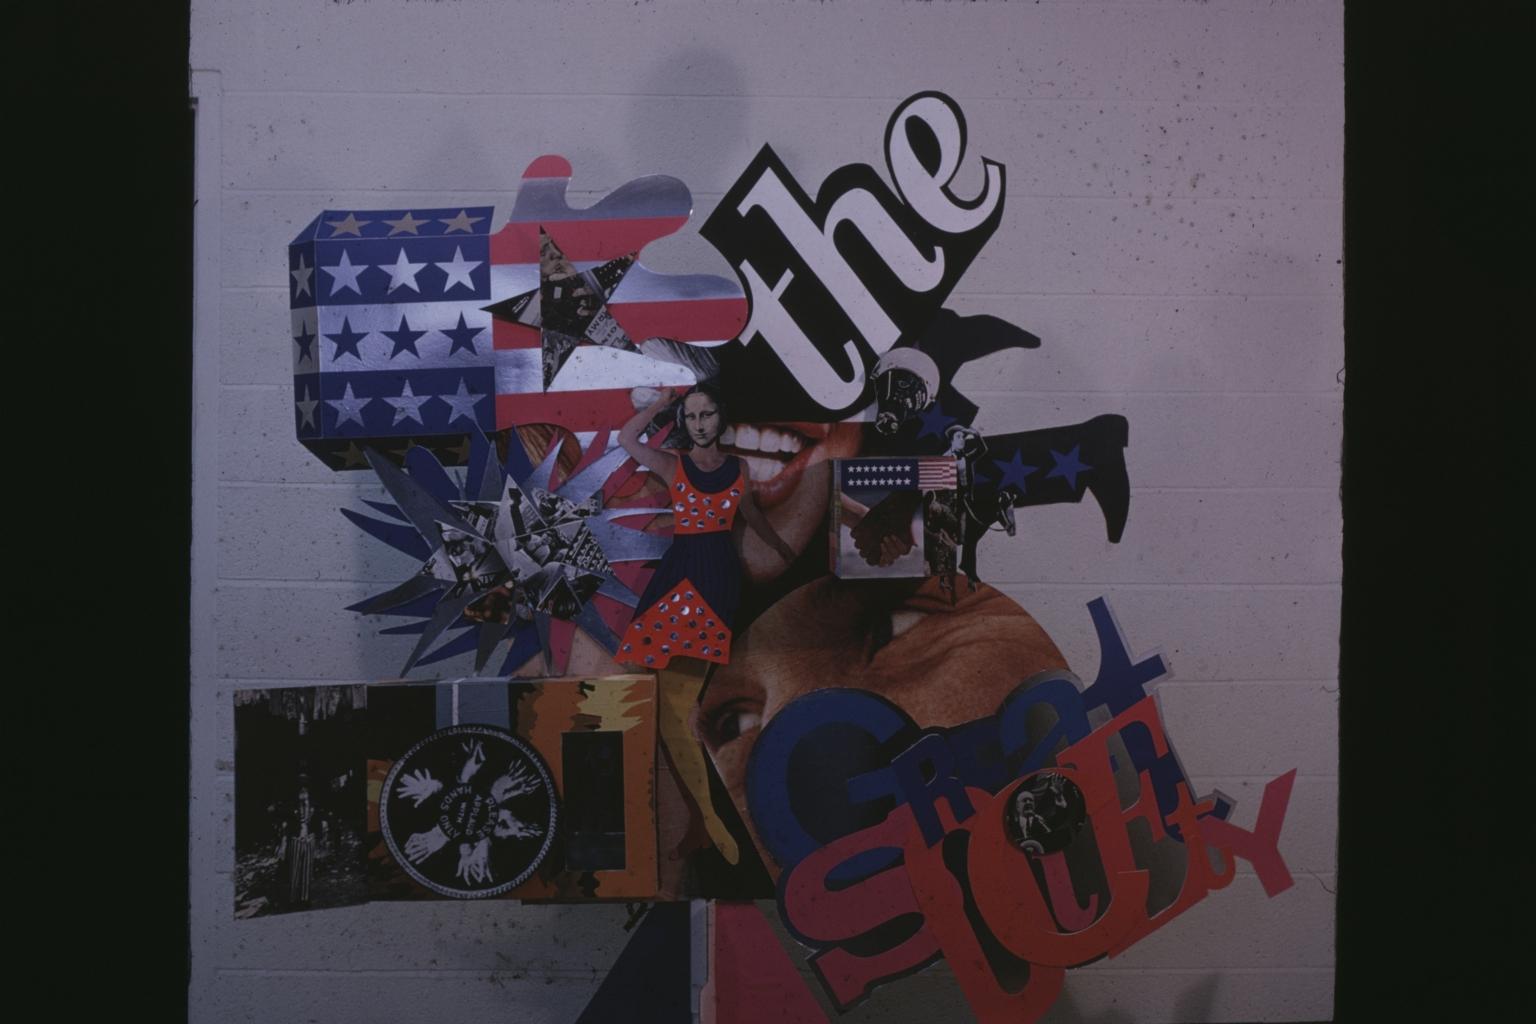 Unidentified Student Artwork (Detail)